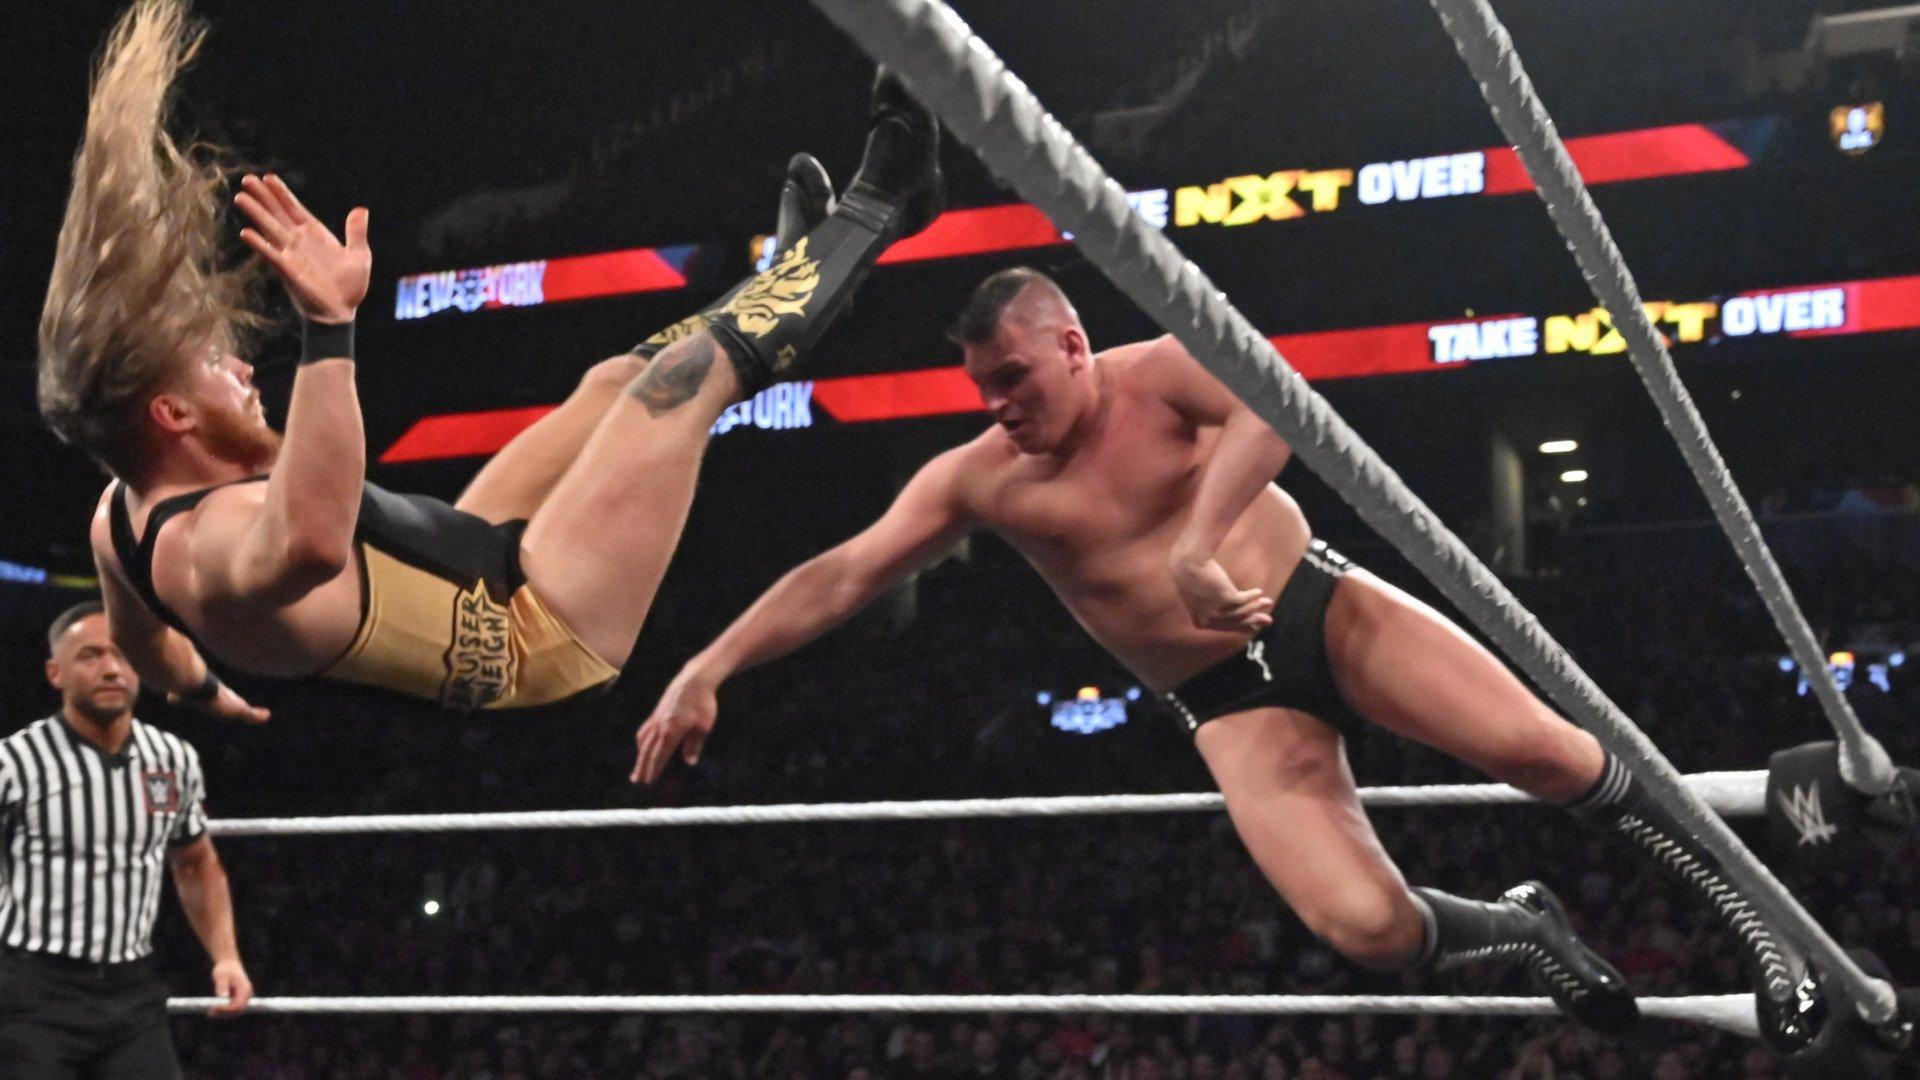 Pete Dunne vs. WALTER - WWE United Kingdom Championship Match: photos